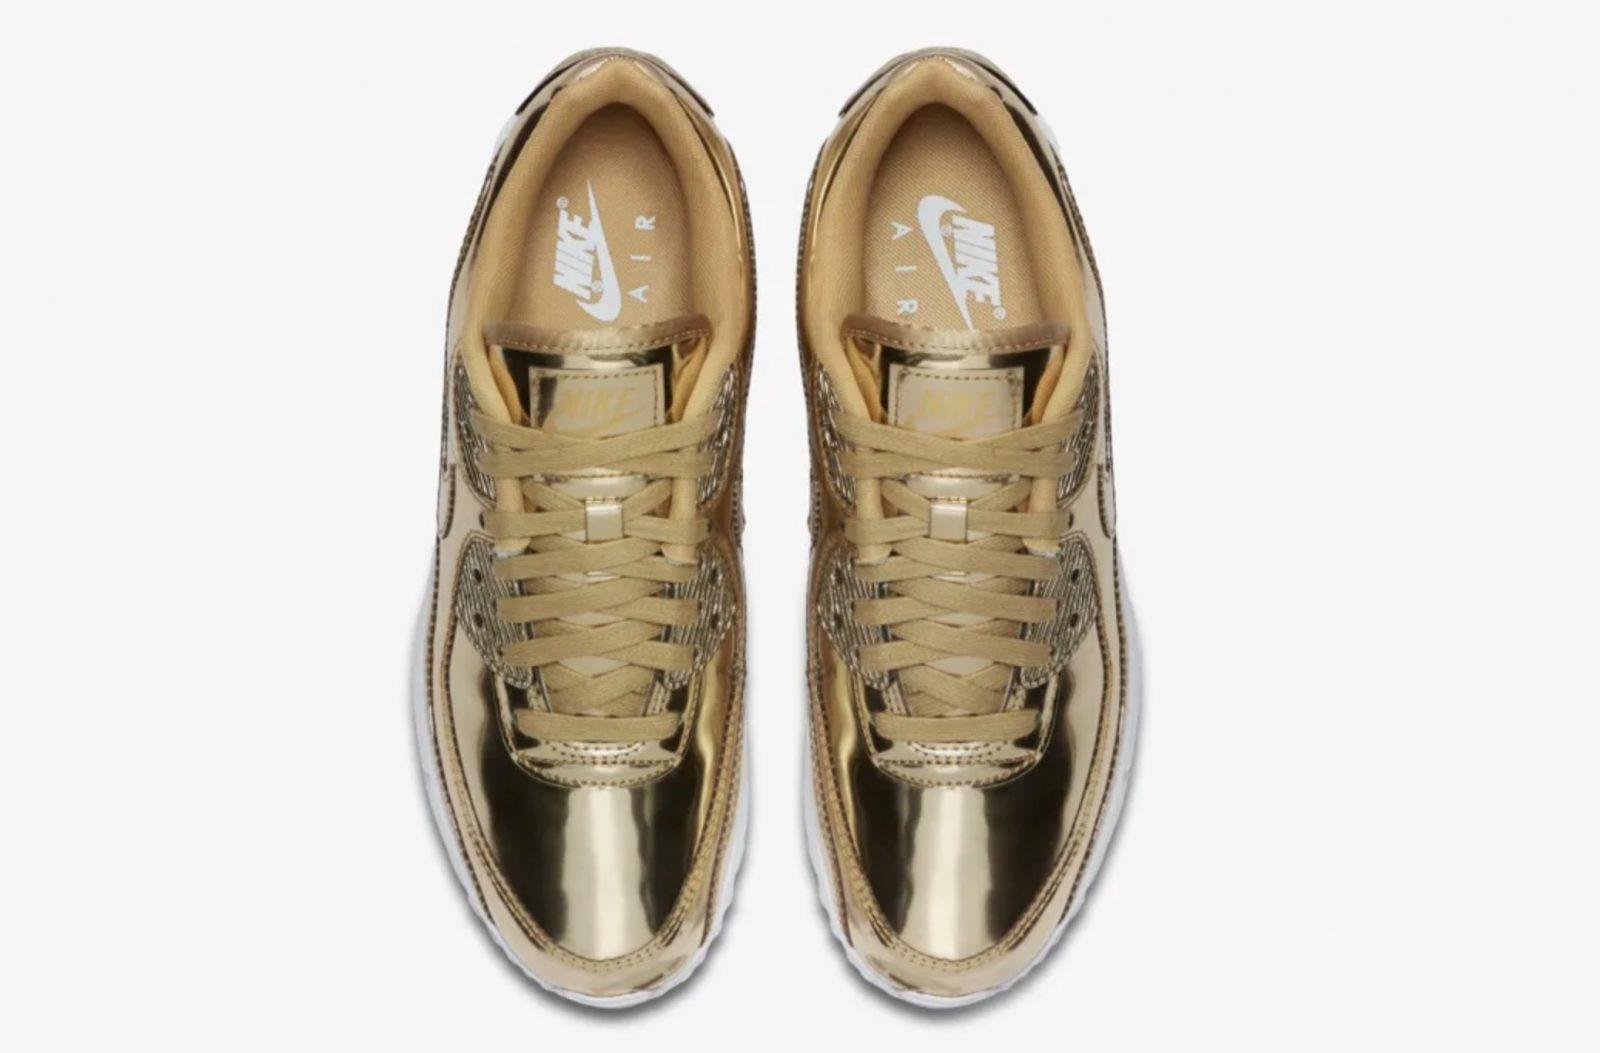 Nike Air Max 90 Liquid Metal Metallic Gold | CQ6639-700 laces